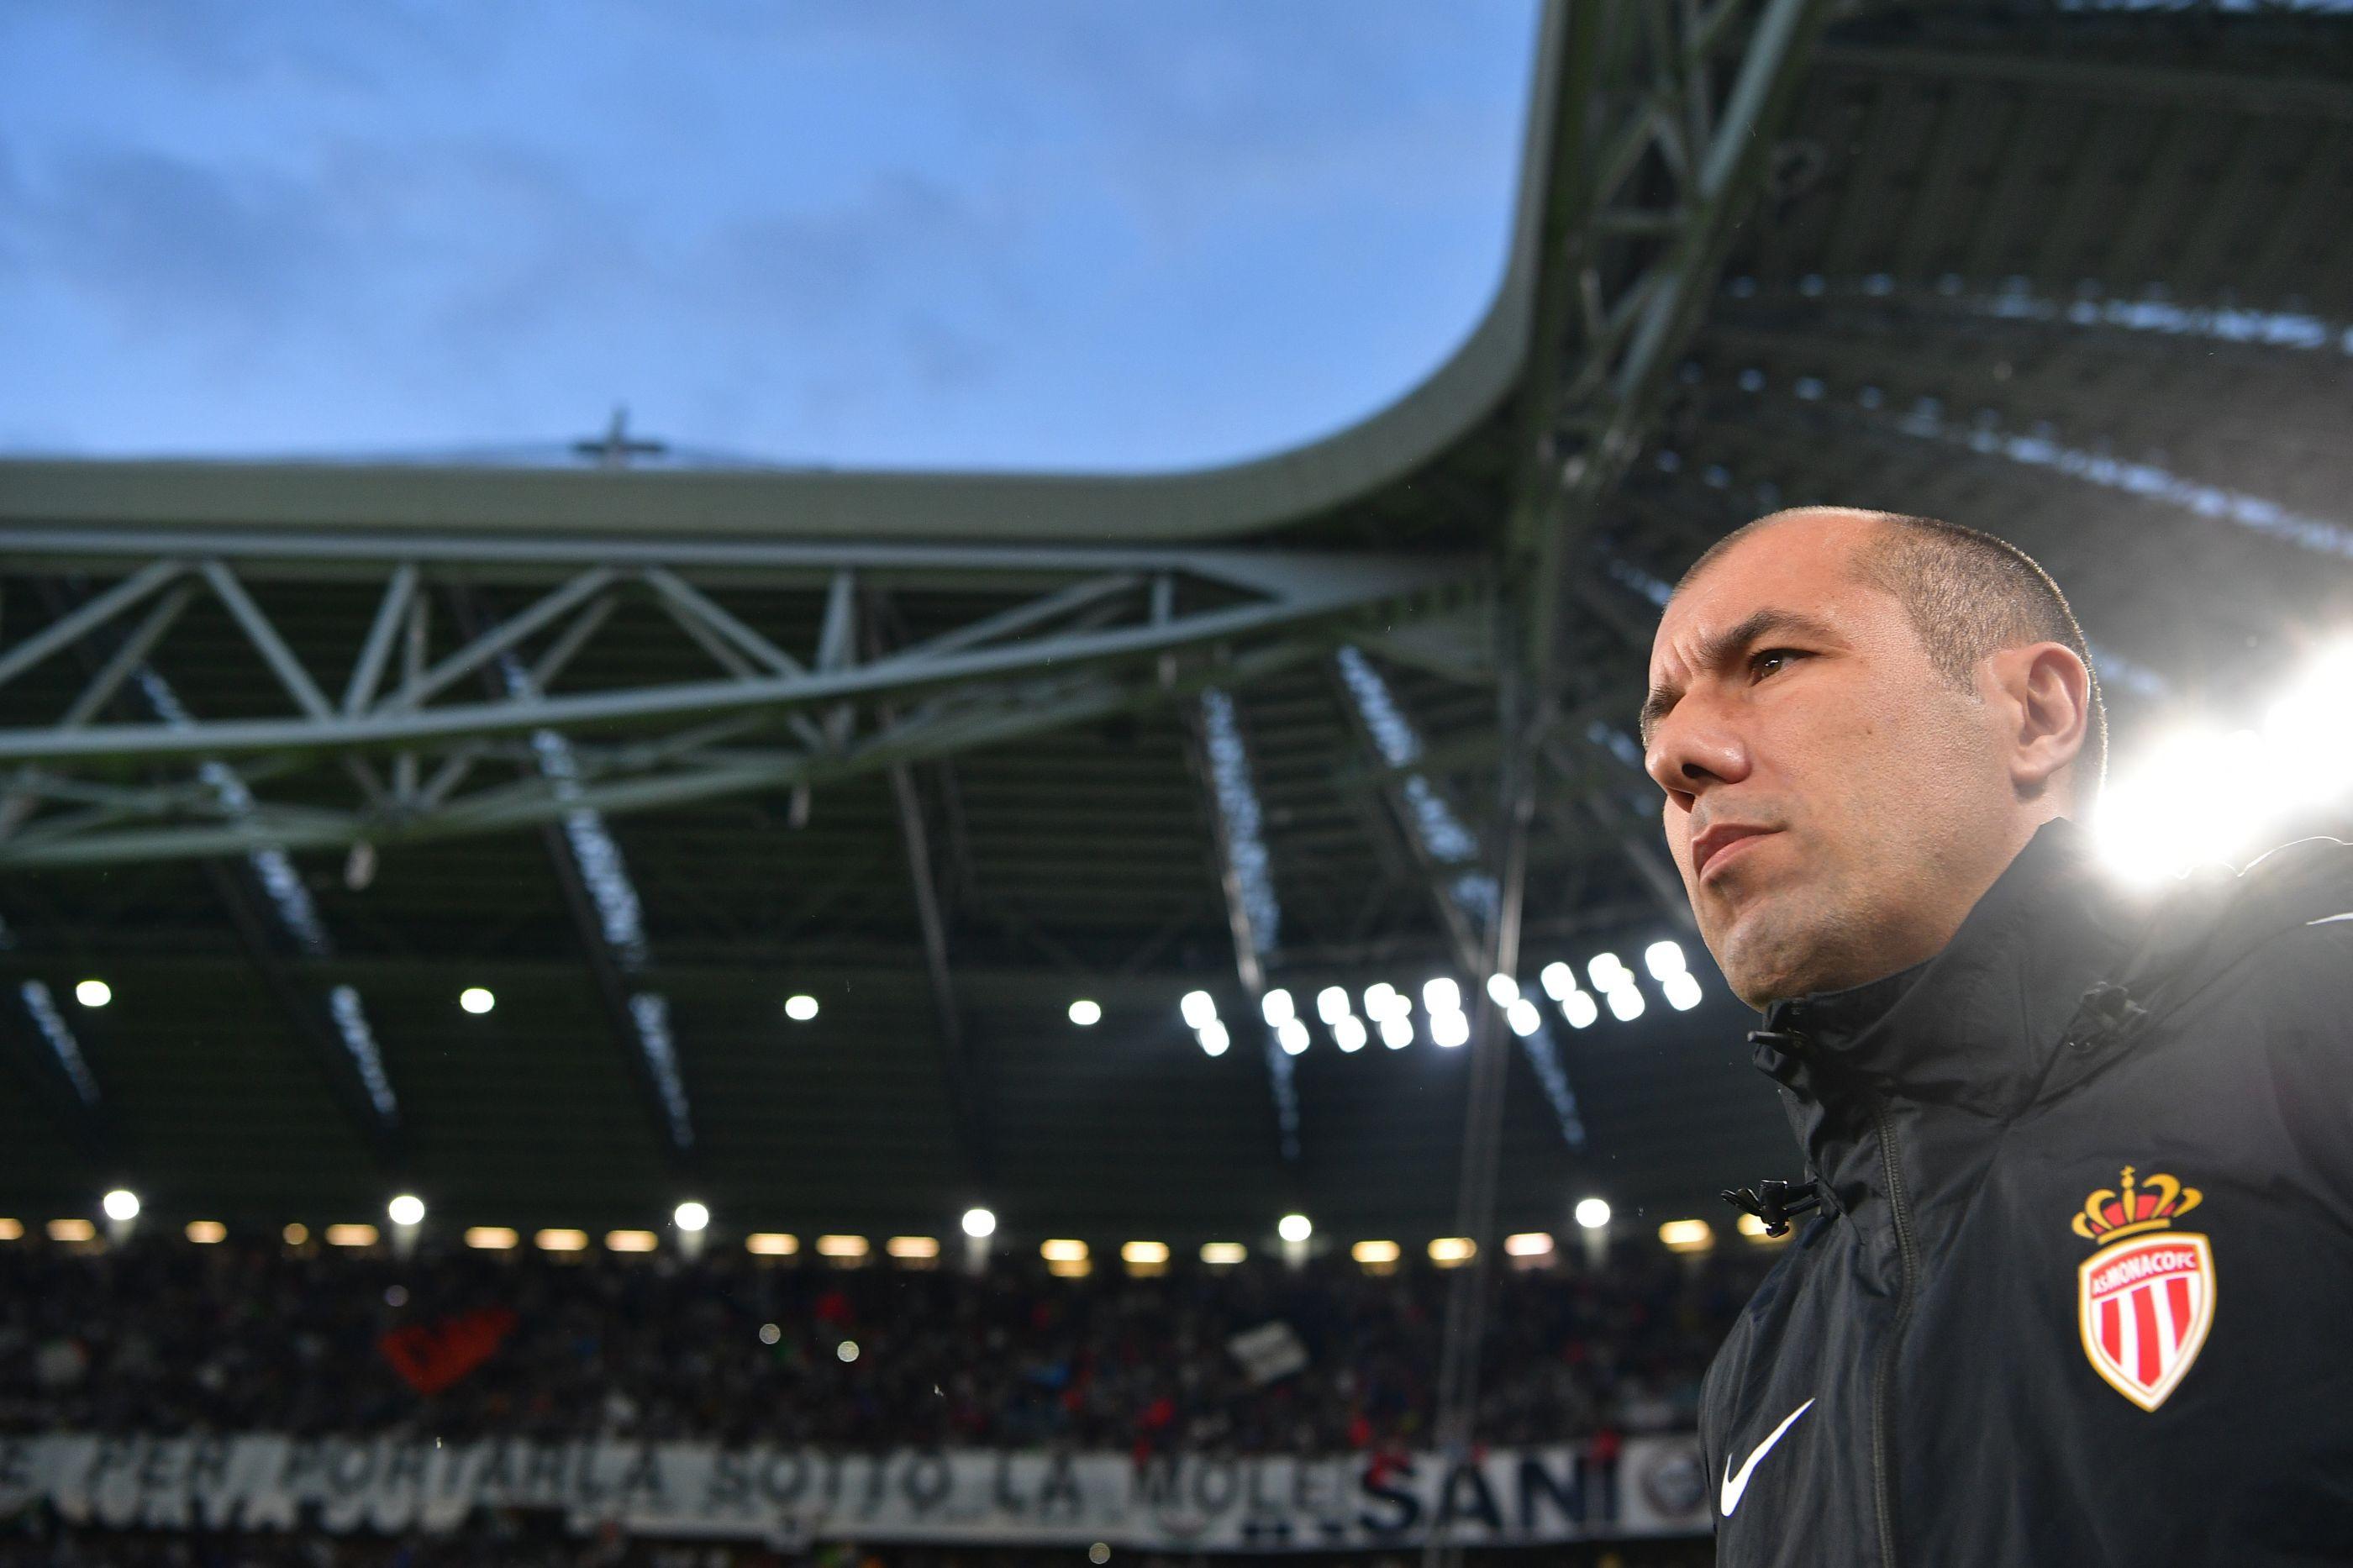 L'Équipe já dá como certo: Leonardo Jardim vai regressar ao Monaco